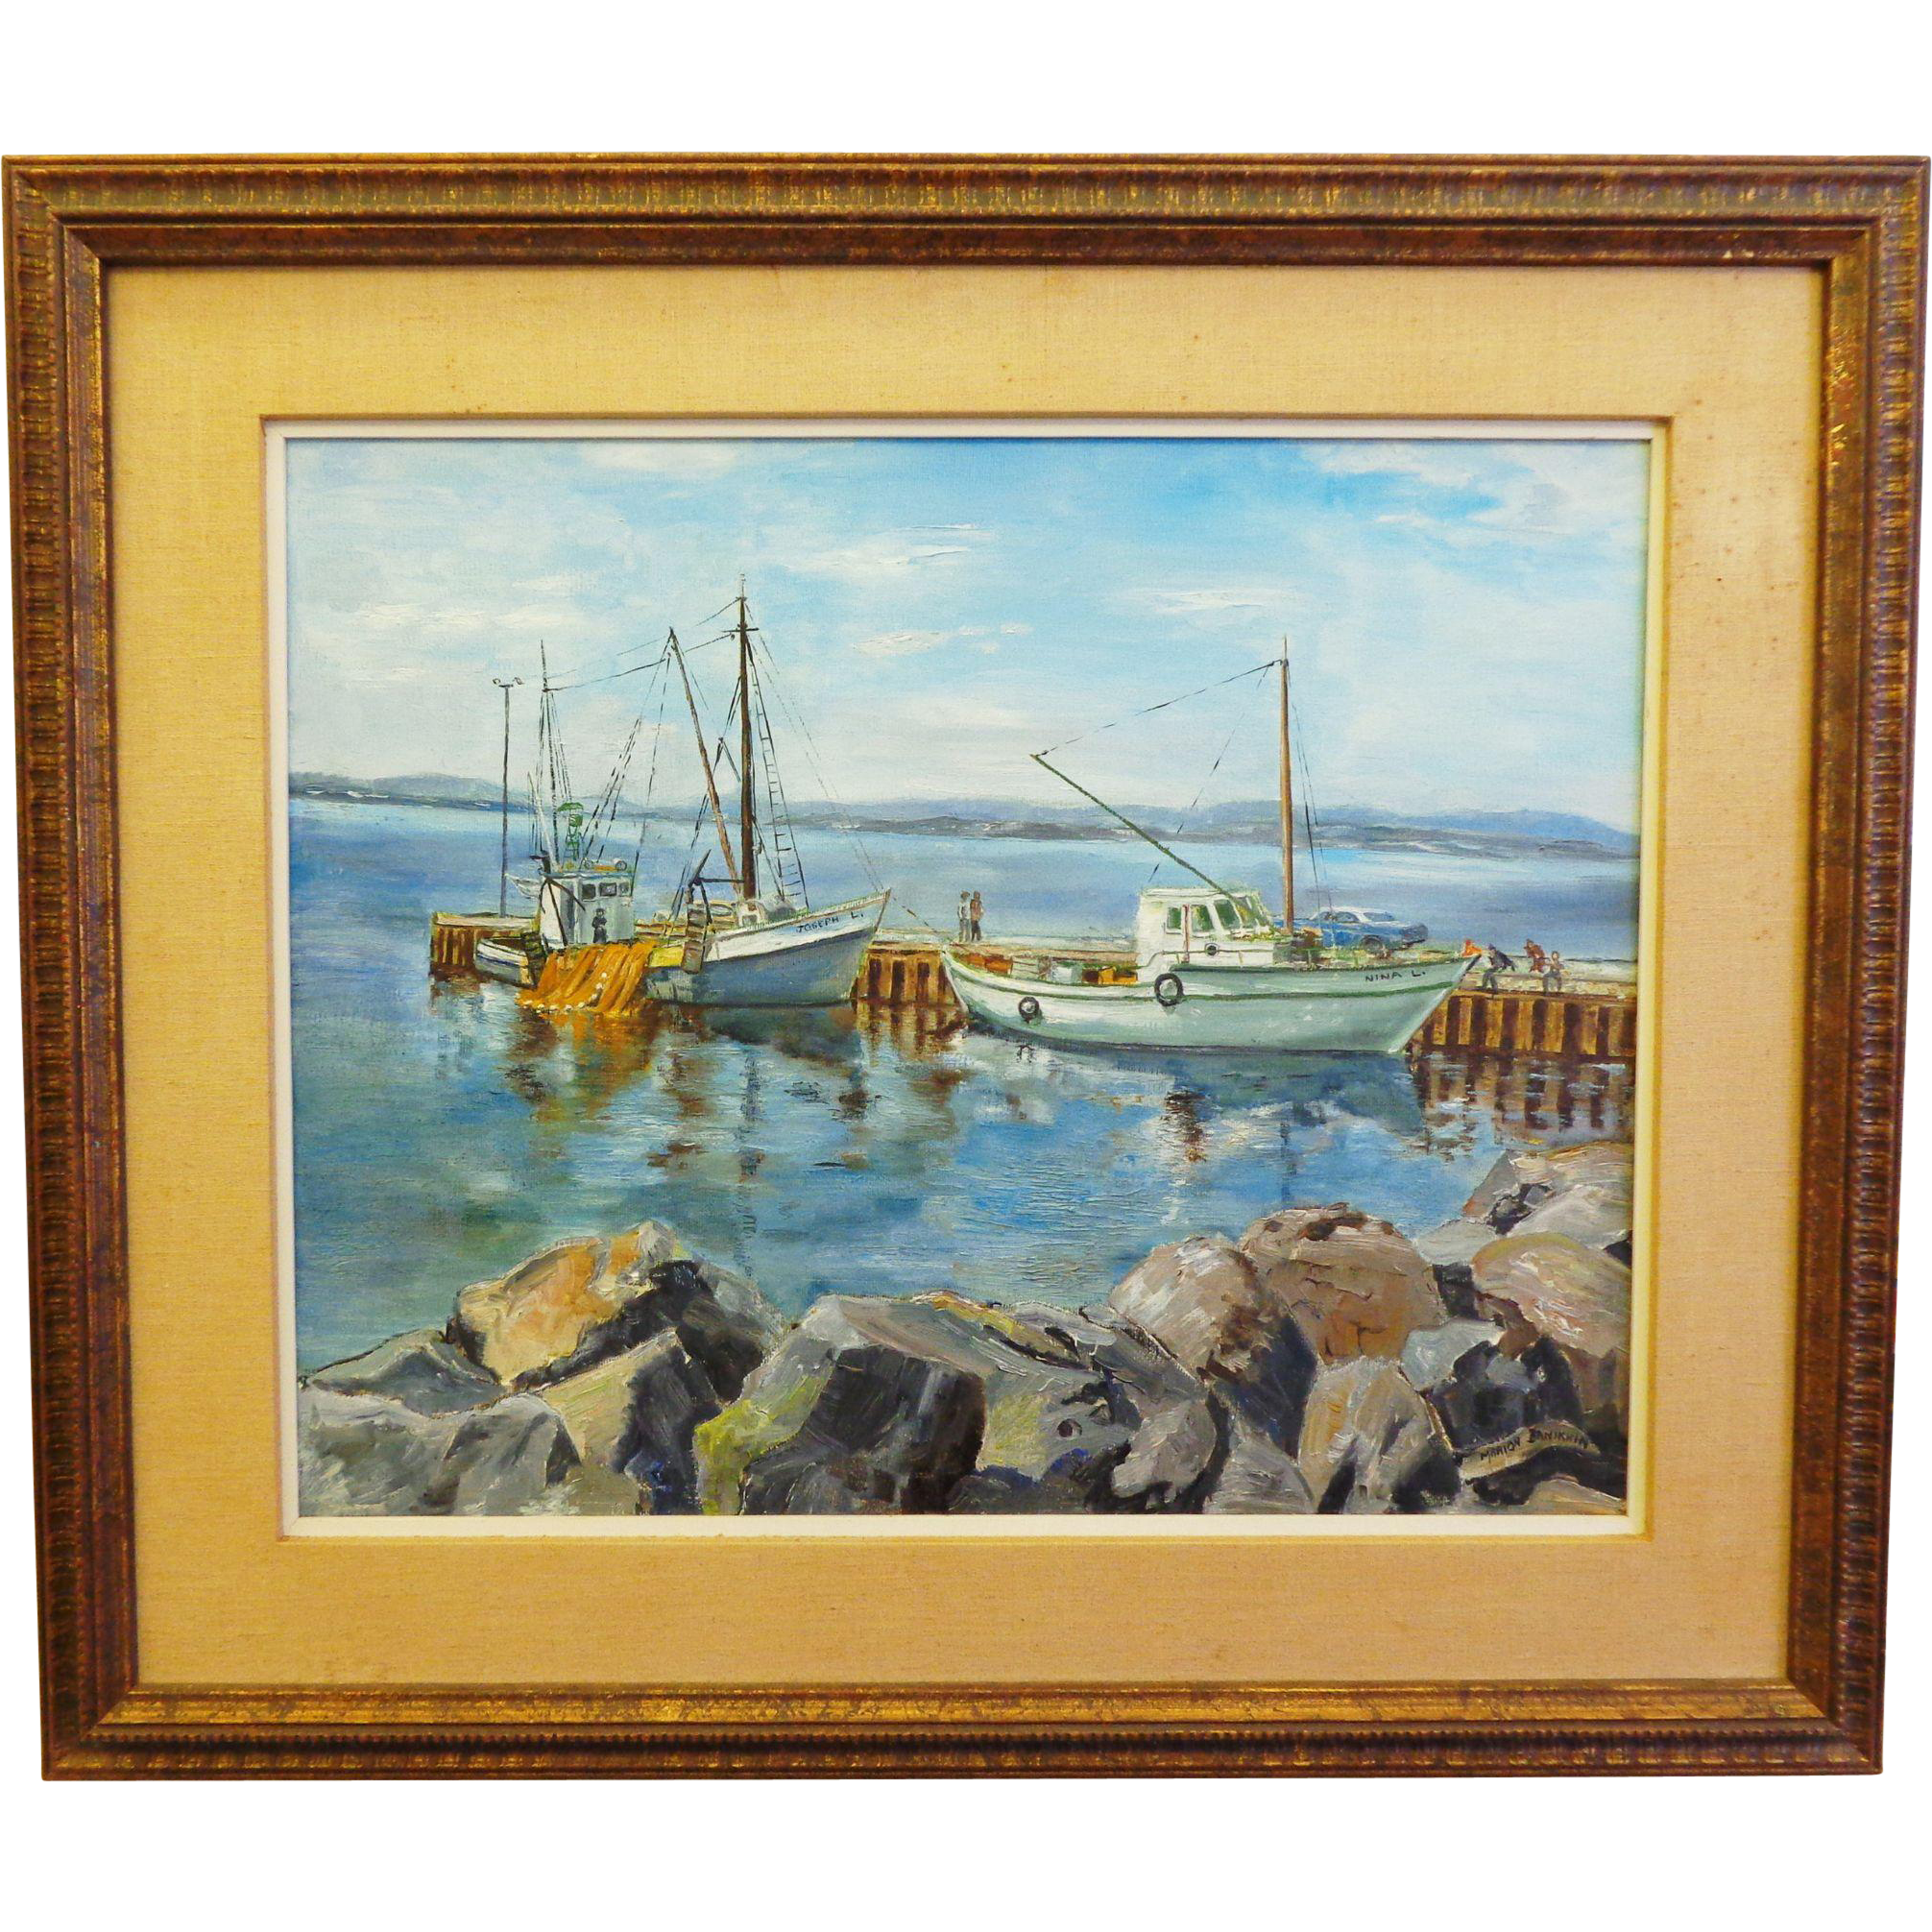 Vintage Oil on Canvas Marine Scene at the Dock Artist Signed